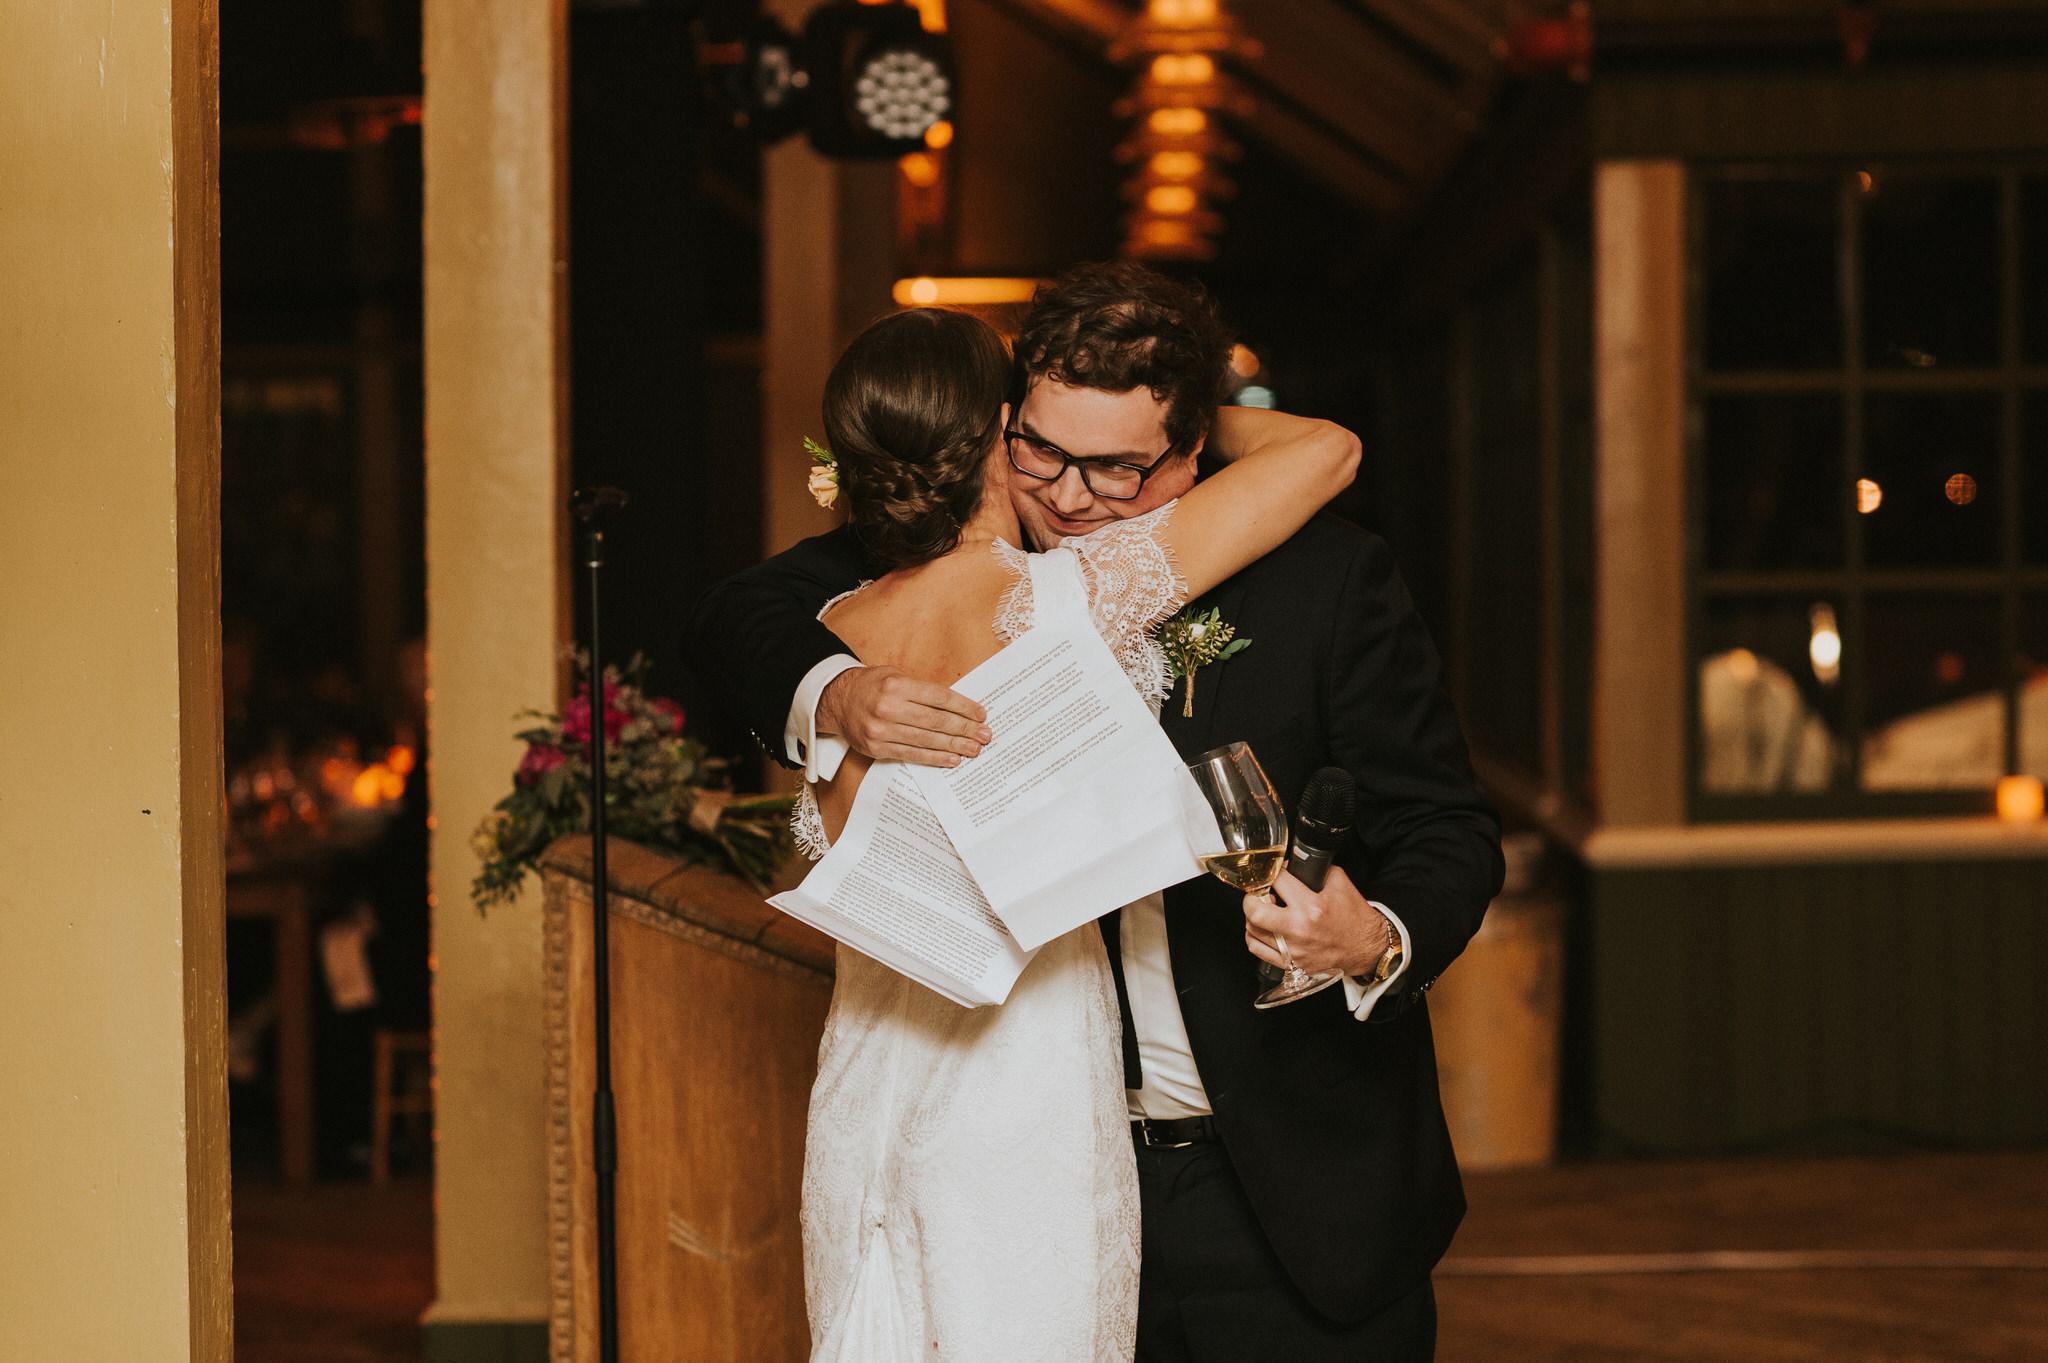 scarletoneillphotography_weddingphotography_prince edward county weddings161.JPG